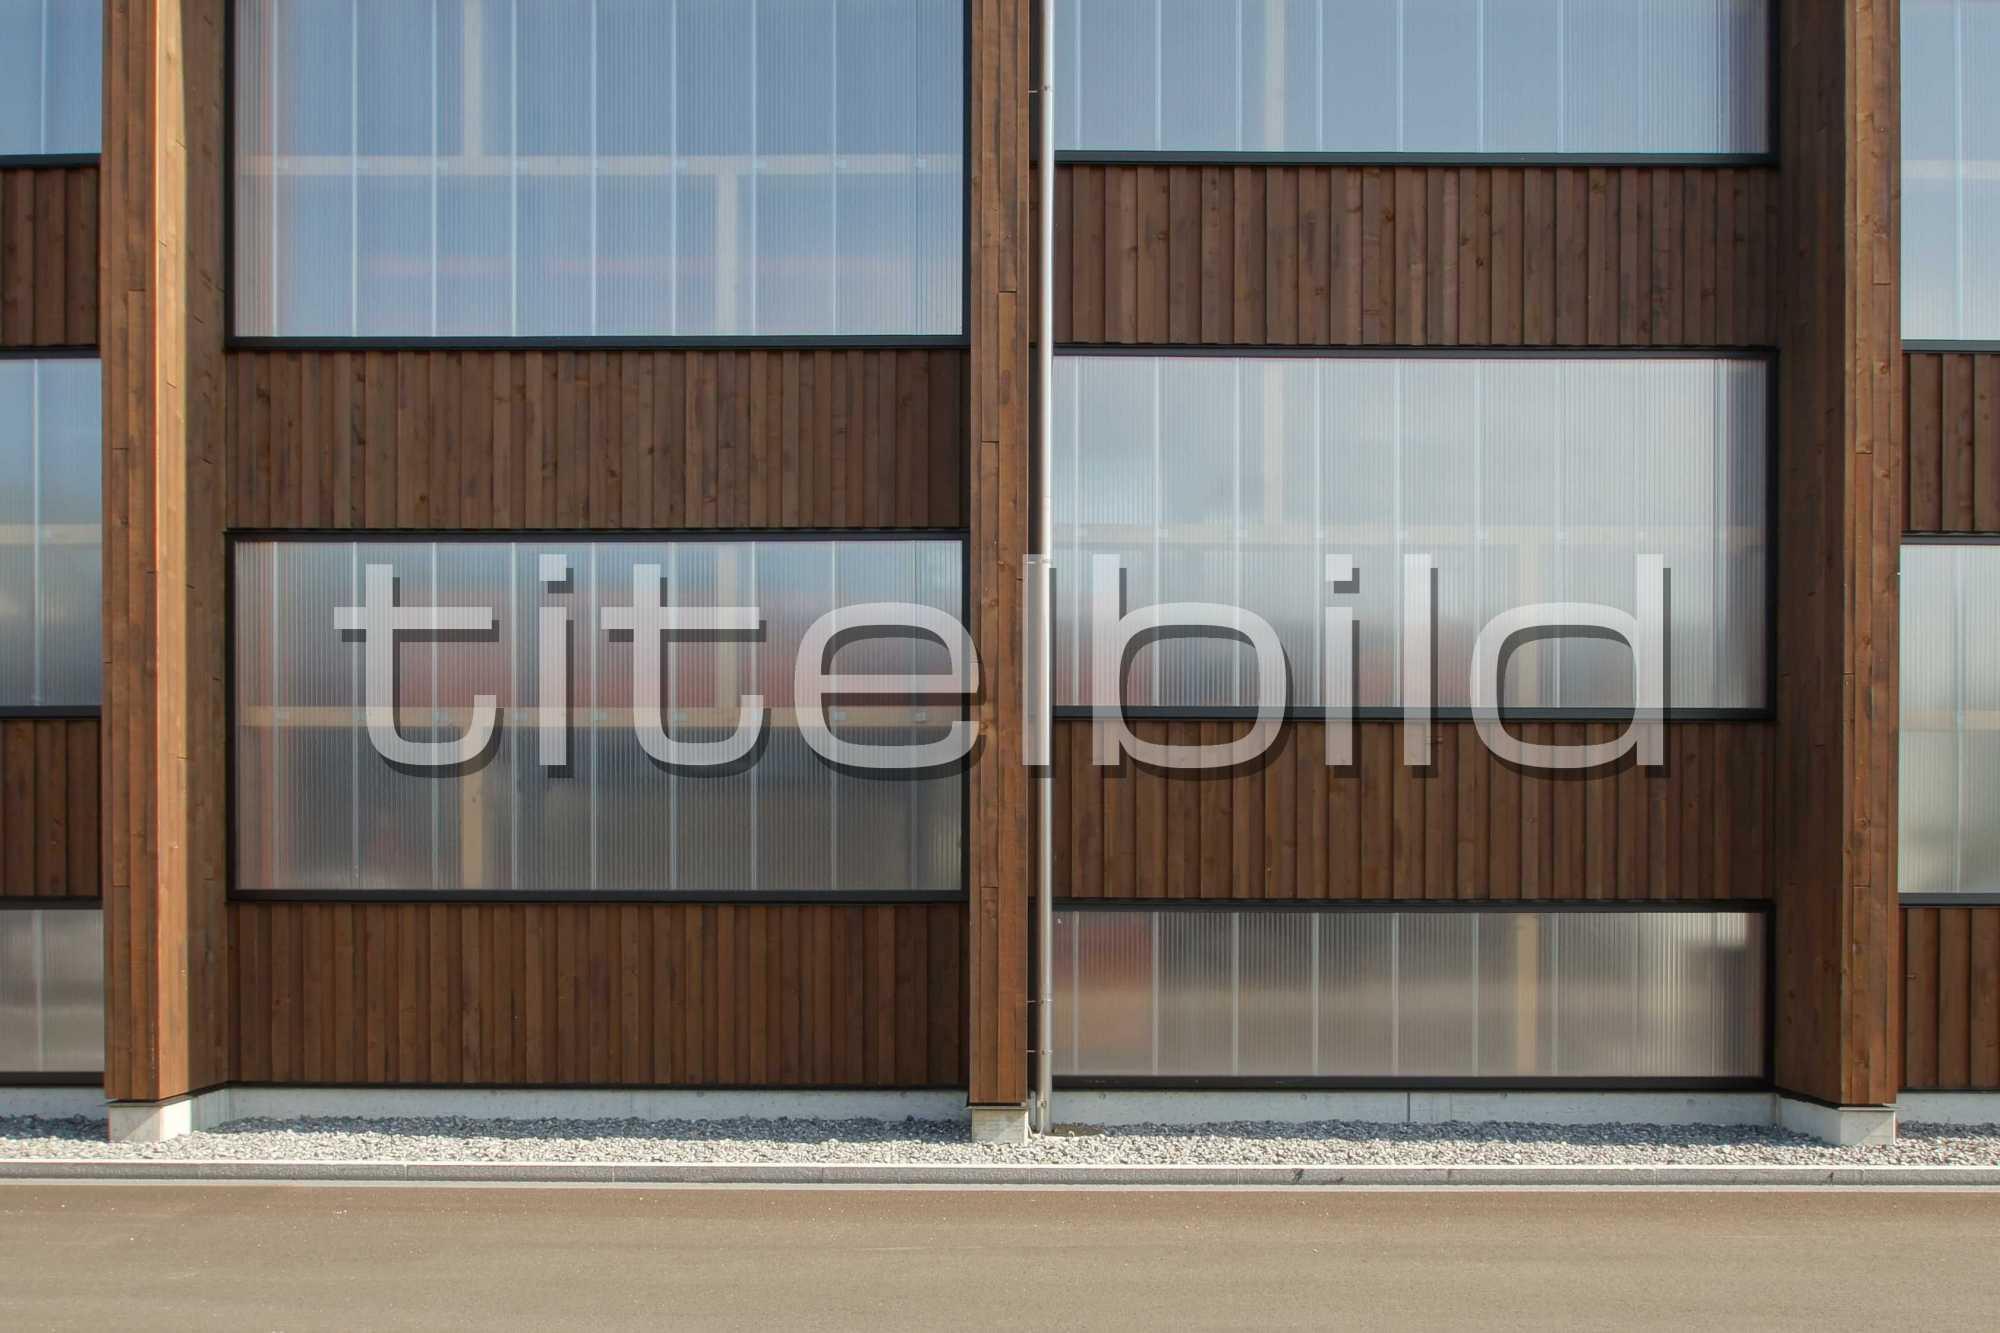 Projektbild-Nr. 3: Autobahn Werkhof Sprengi